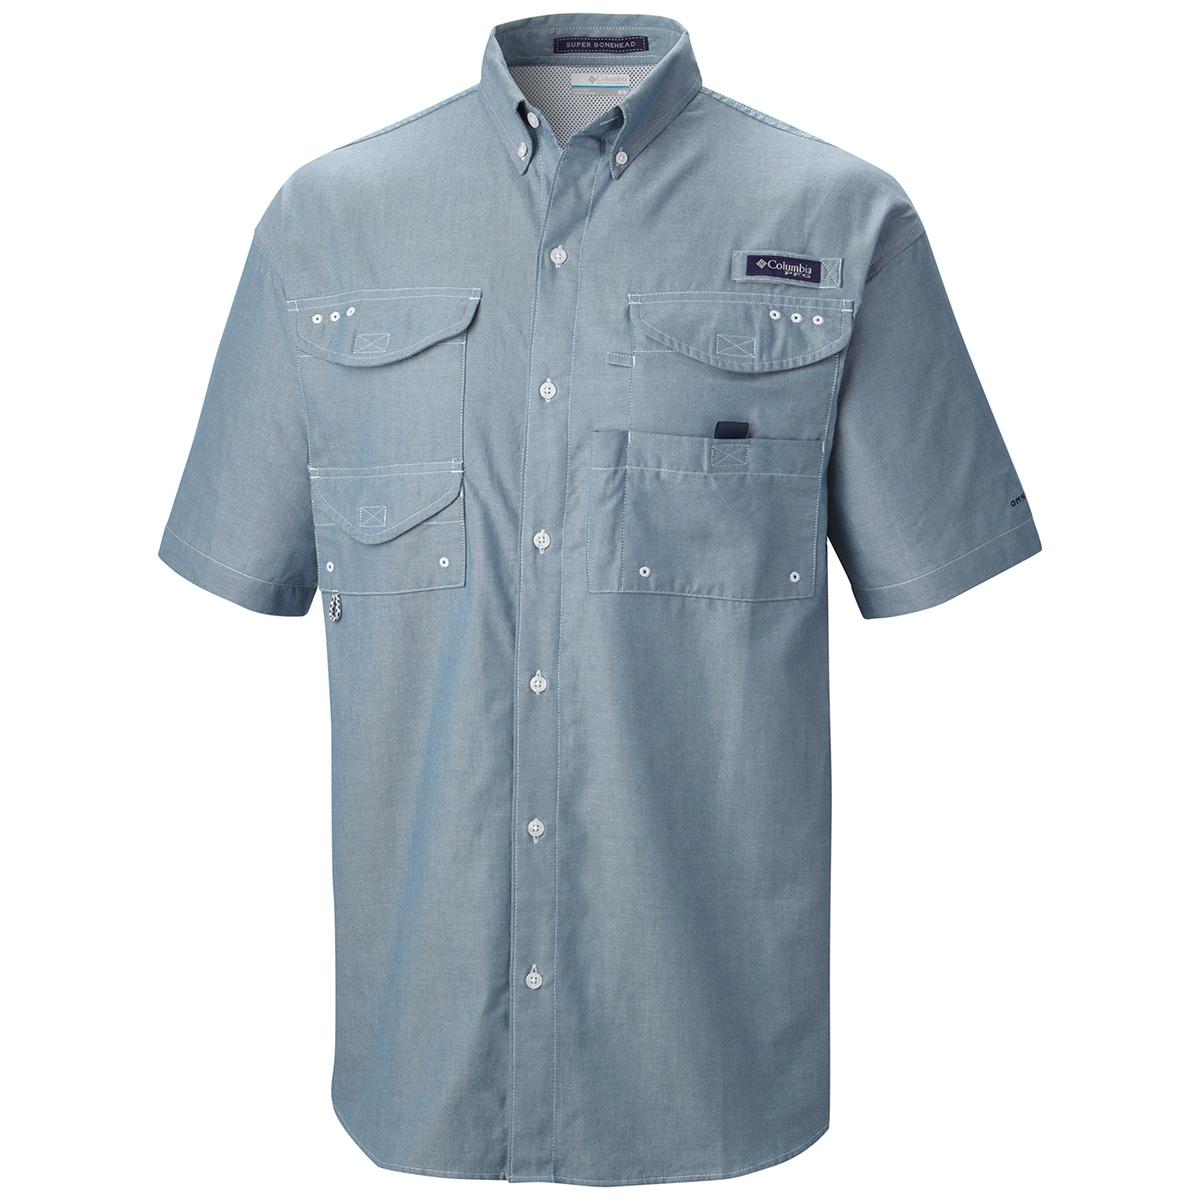 Columbia super bonehead classic ss shirt 2015 fishing for Pfg fishing shirts